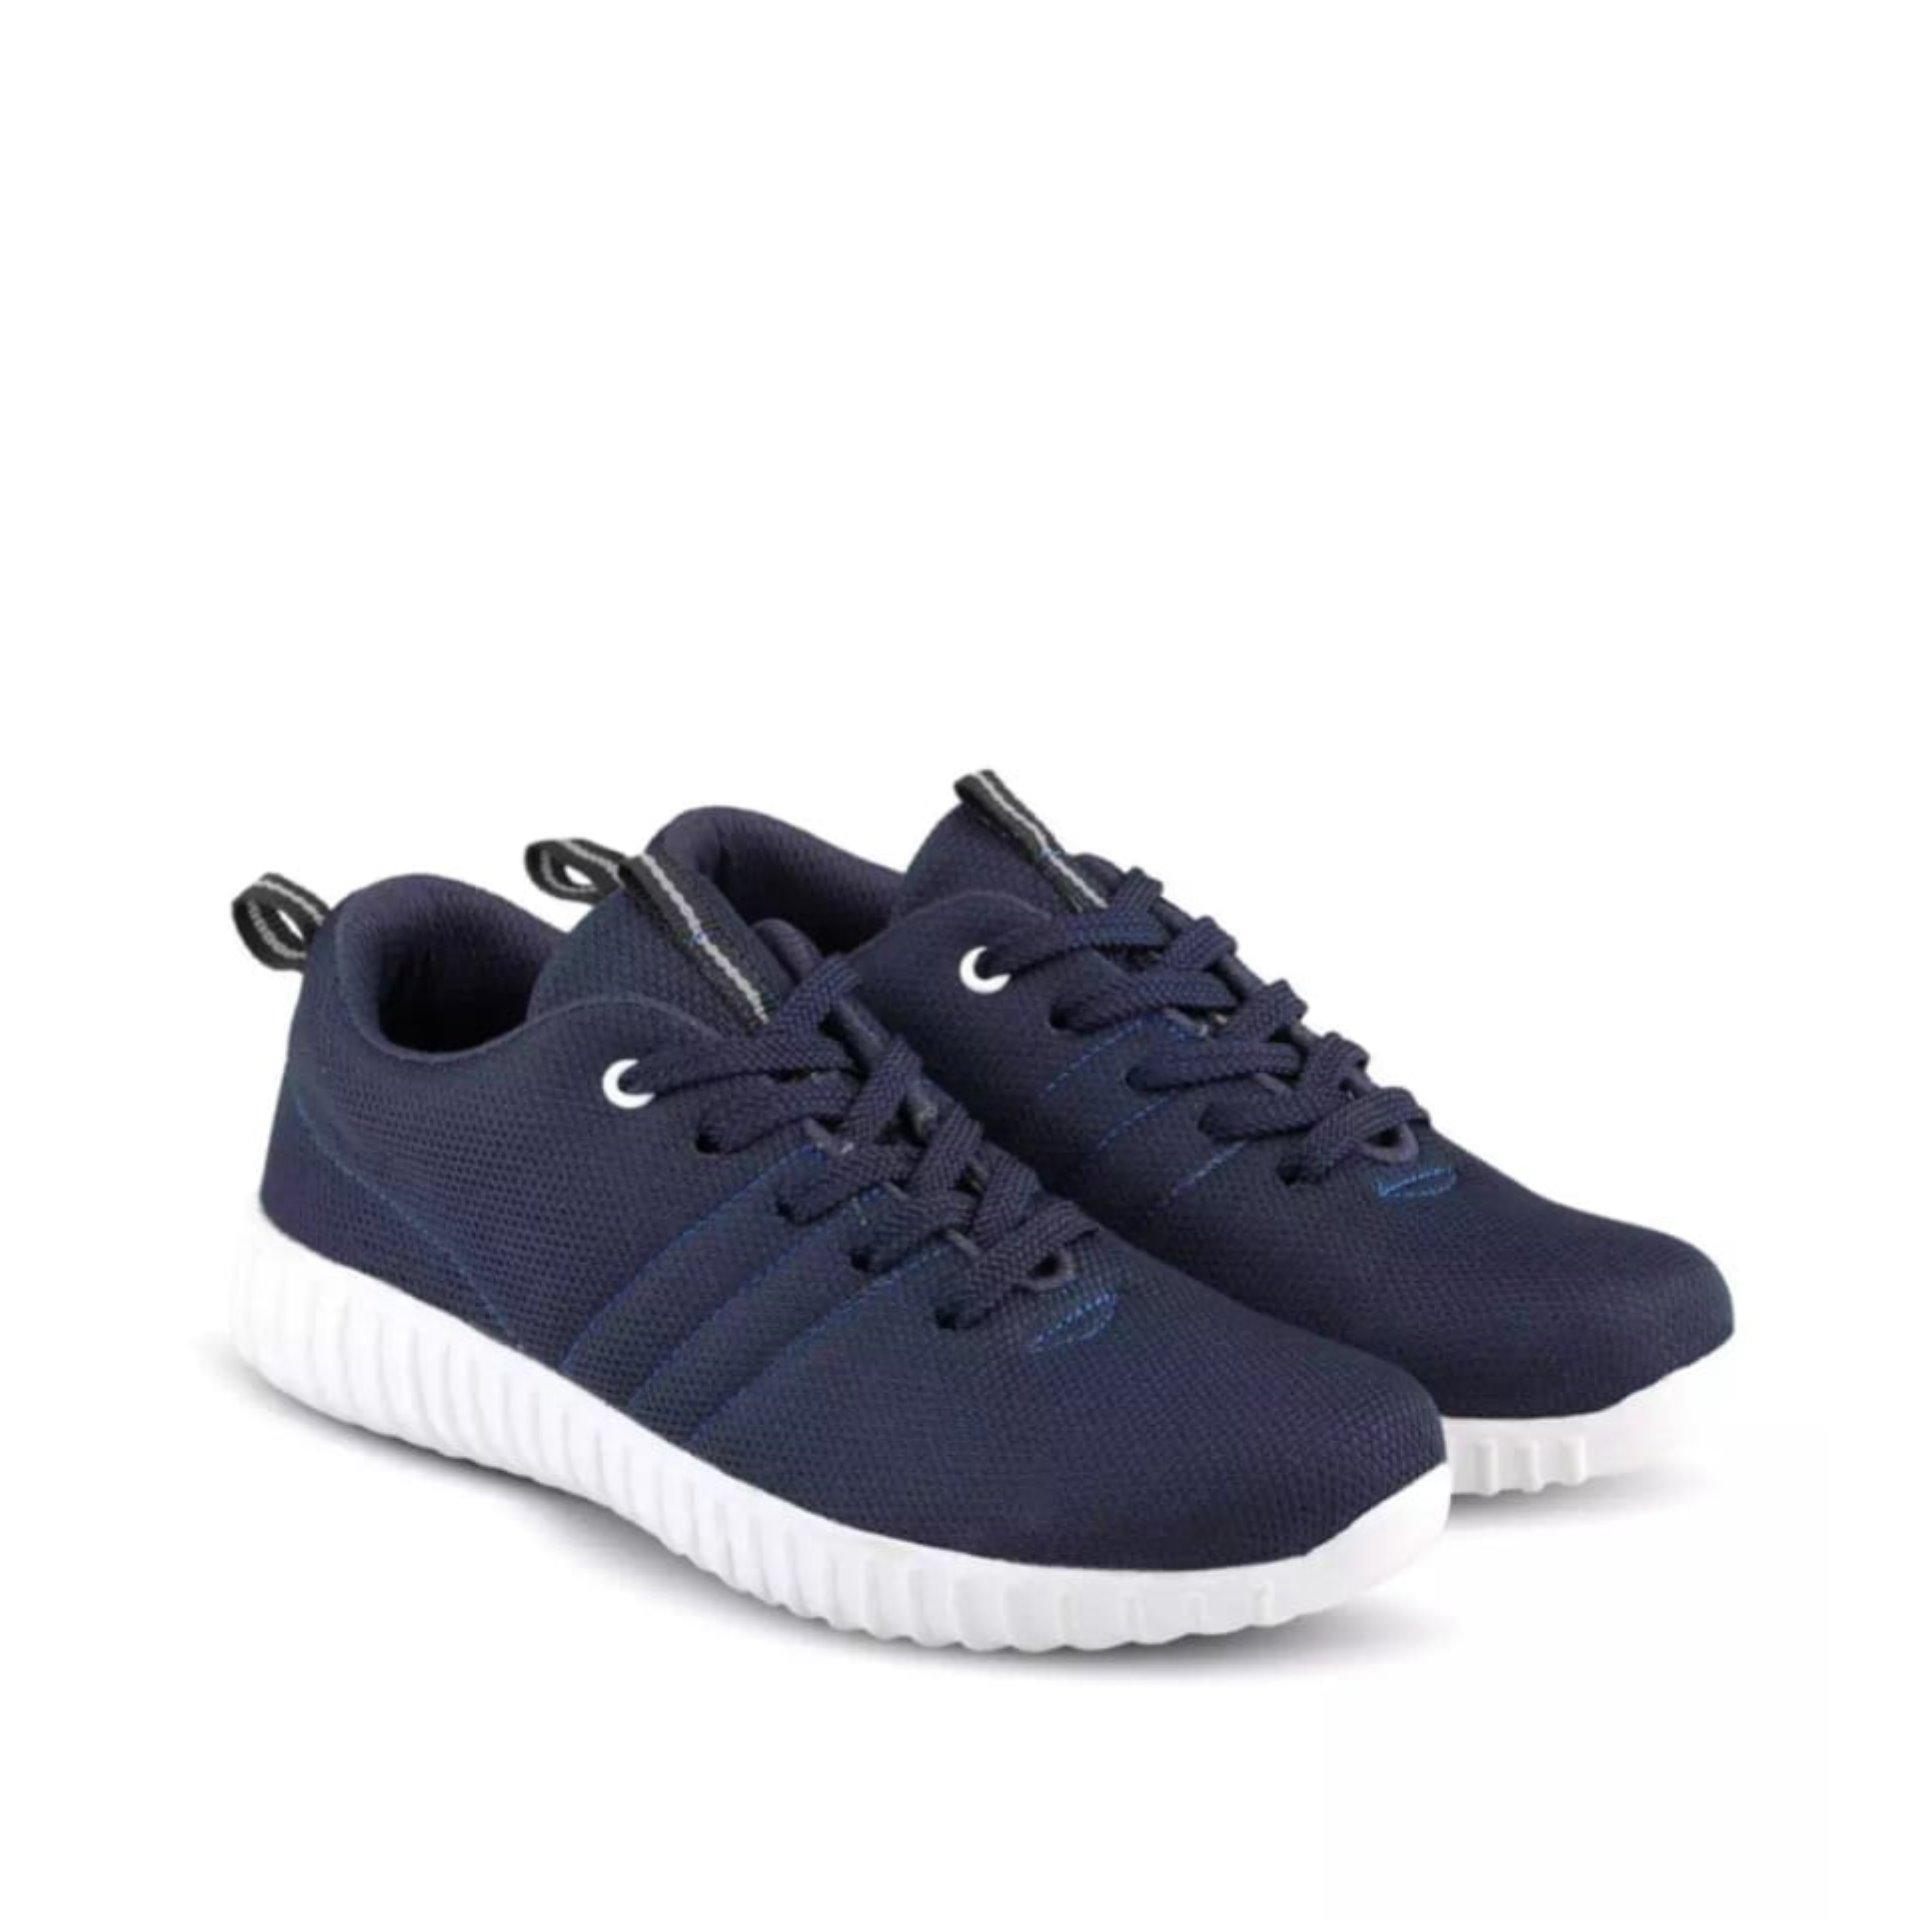 Sepatu Olahraga Pria Terbaik Nike Airmax Kets Sport Casual Wanita Adinova Shoes Adinio Gaya Santai